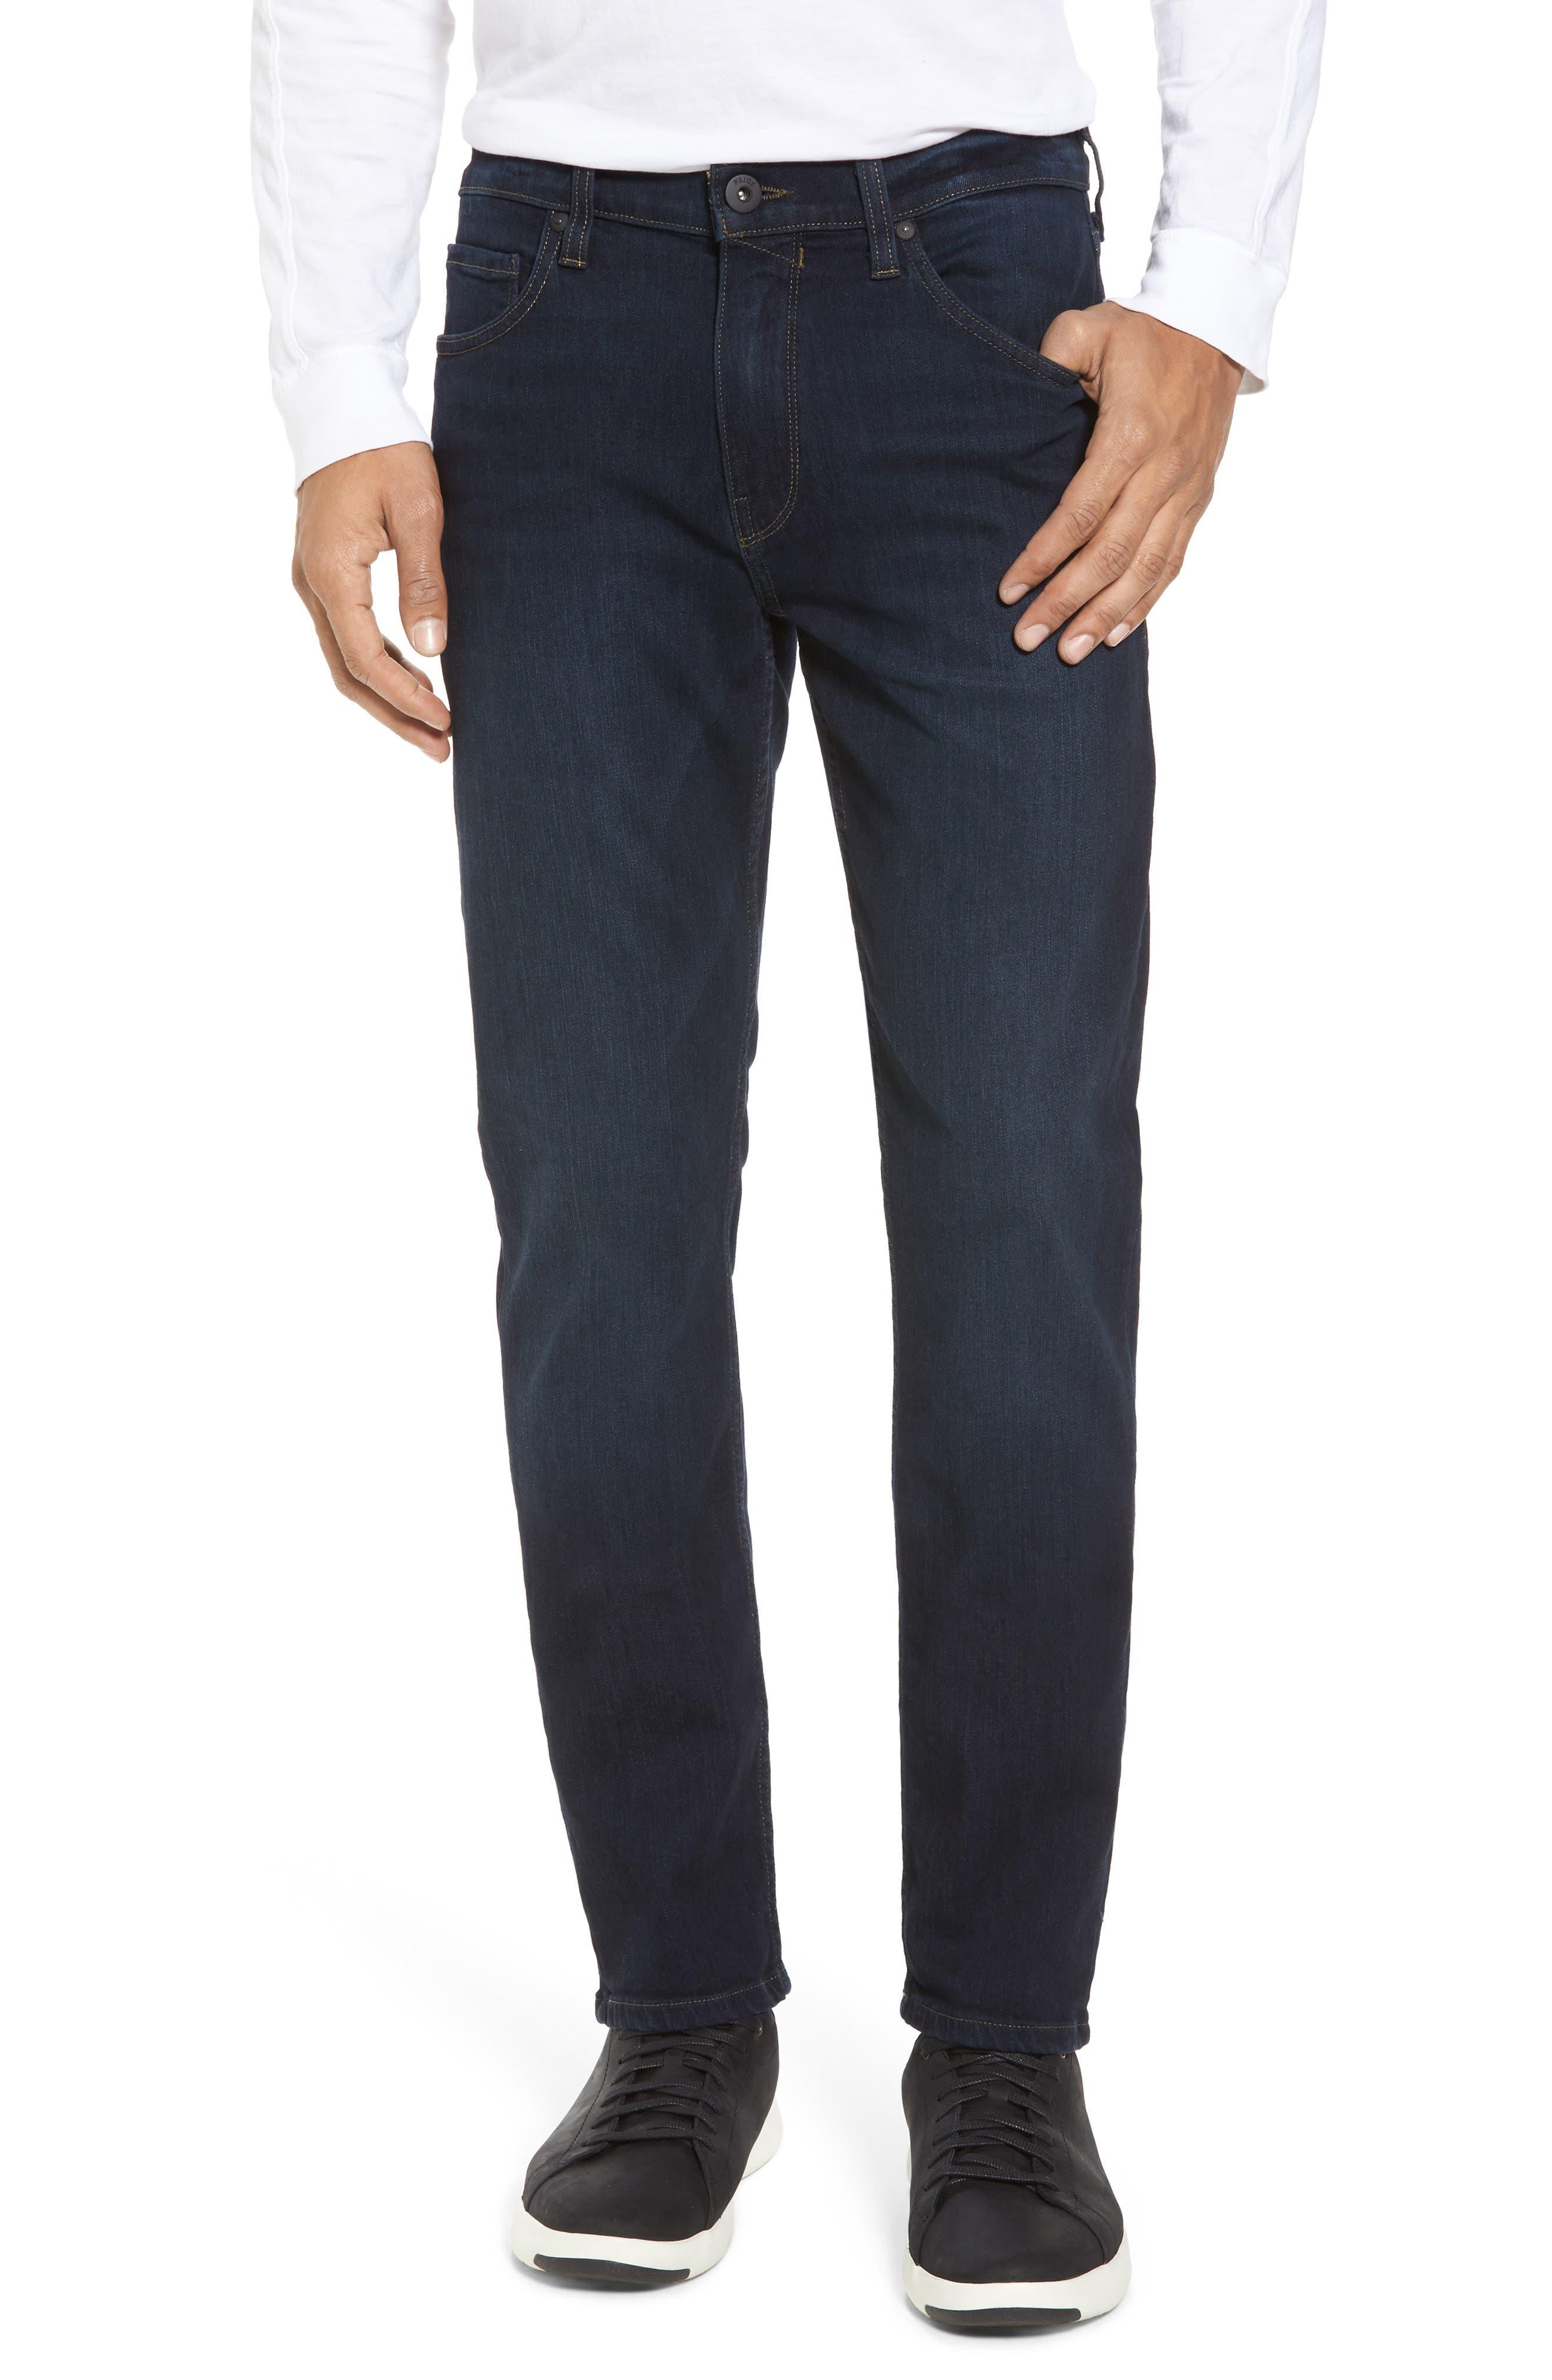 Lennox Slim Fit Jeans,                             Main thumbnail 1, color,                             Jonathan